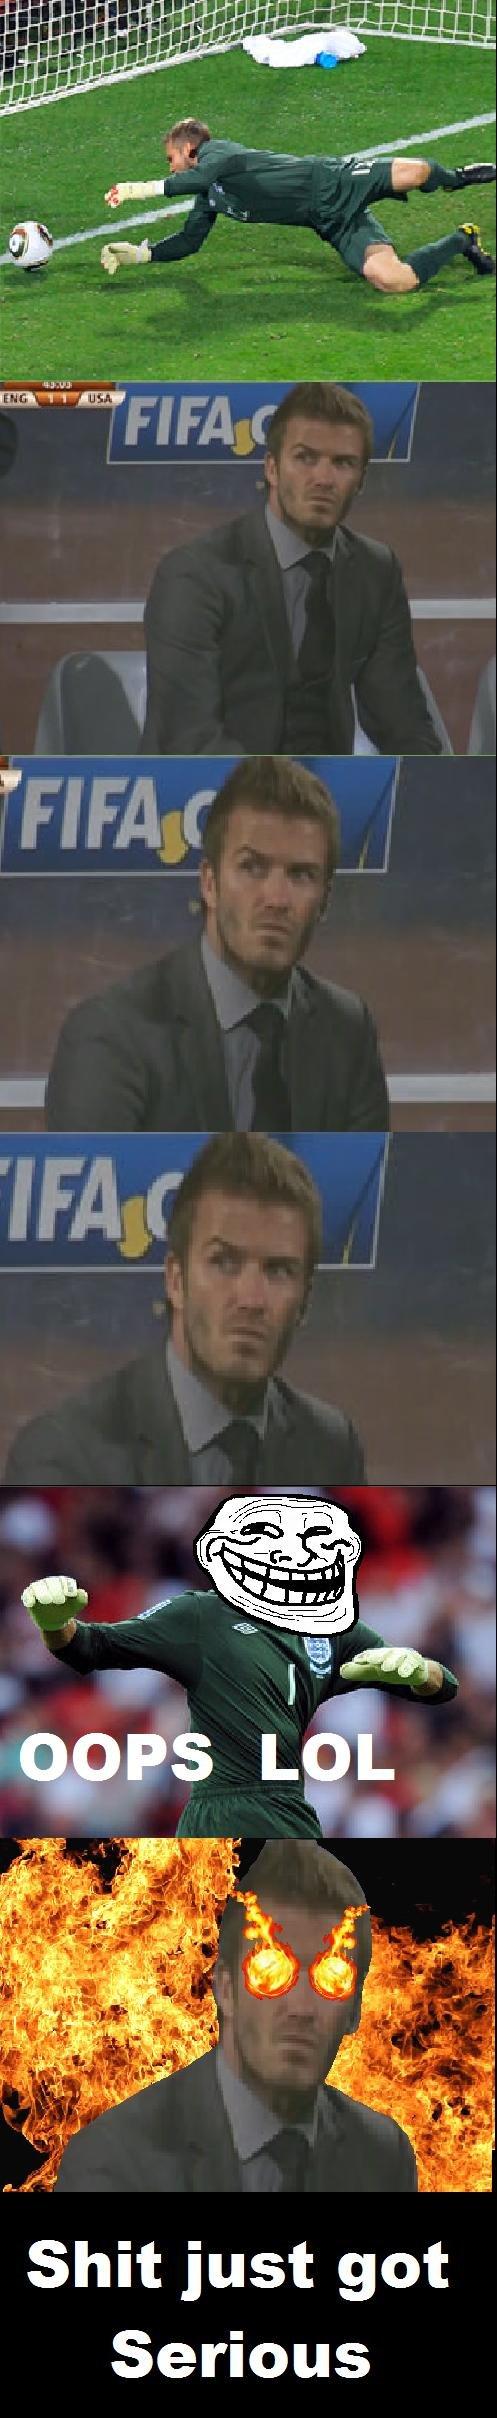 "Beckham's Rage. Run Rob Green! RUN!. just got nous Shi Seri. i lol'd at the ""oops lol"" frame. XD"